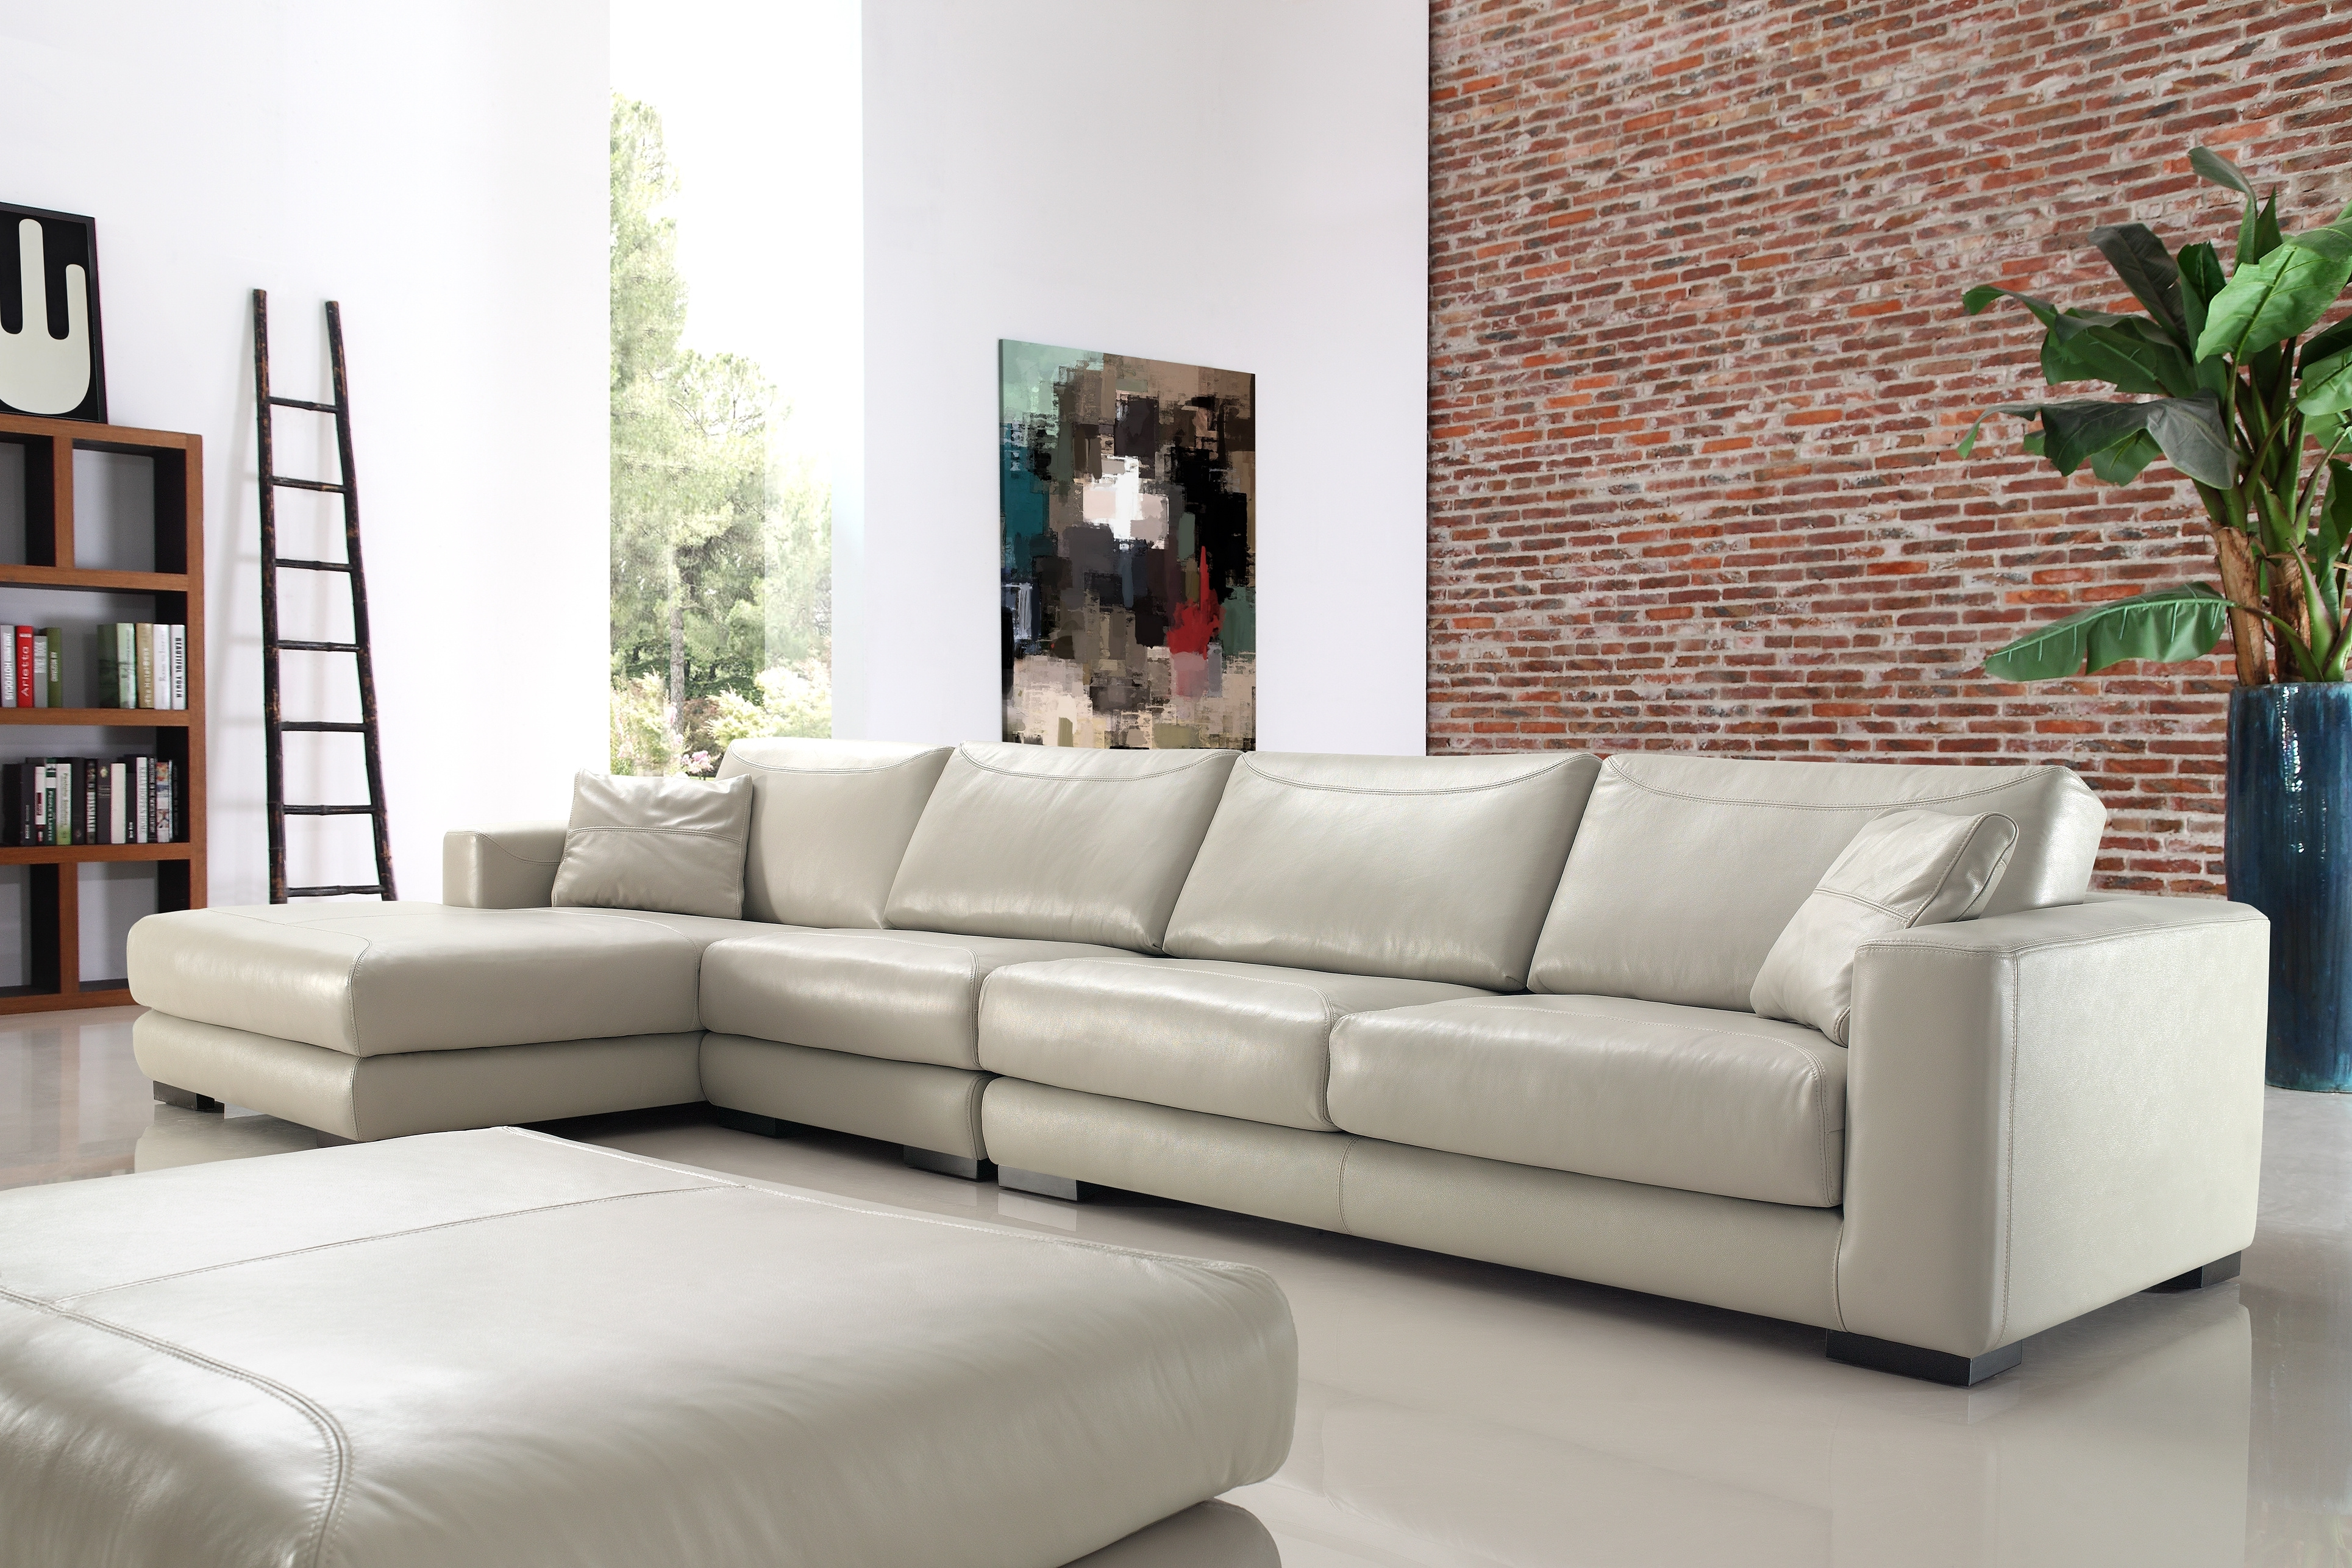 Buy Lexus Leather Corner Sofa Online In London Uk